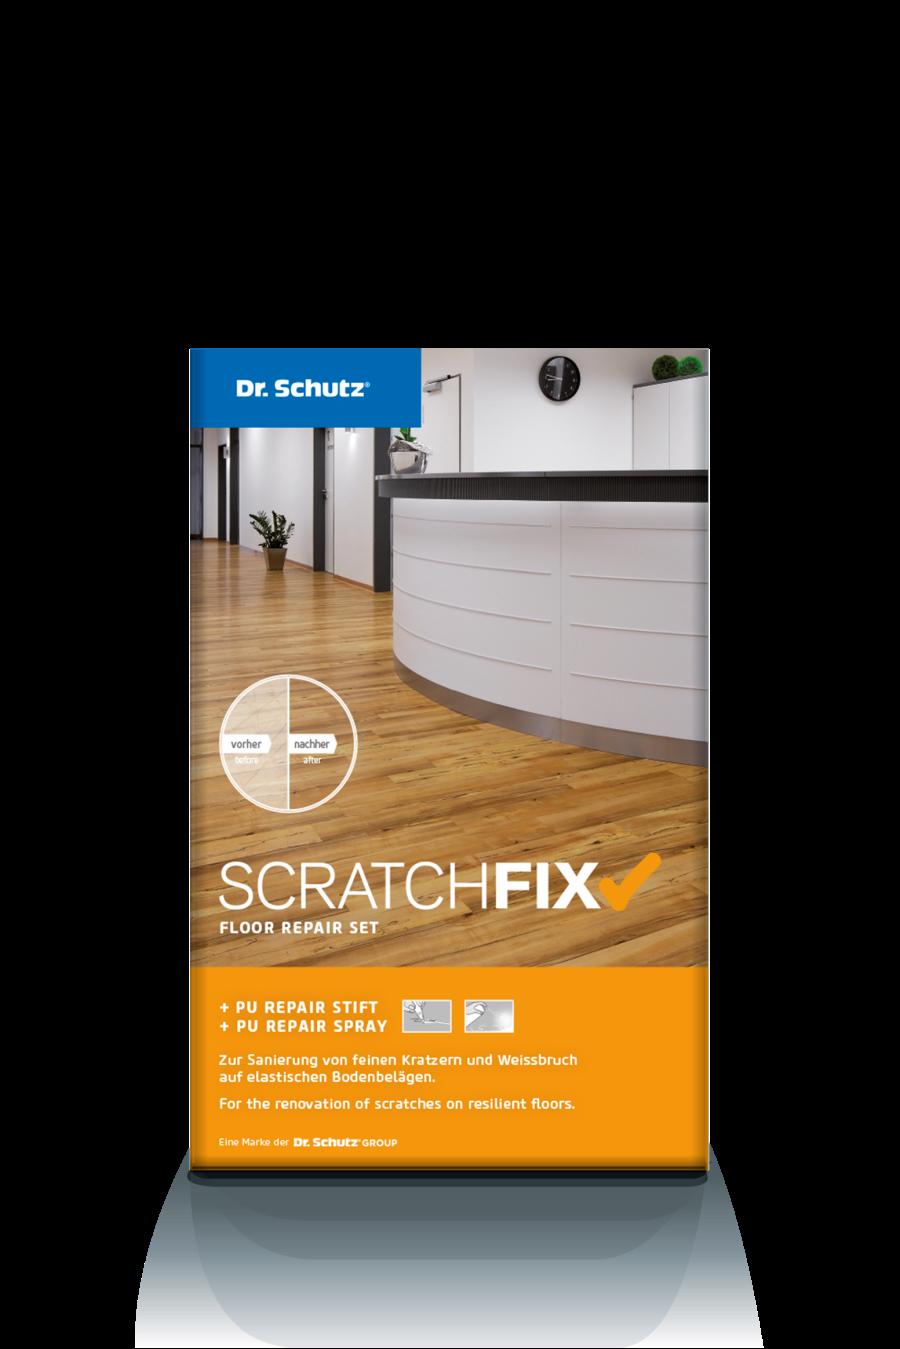 Scratch Fix Floor Repair Set